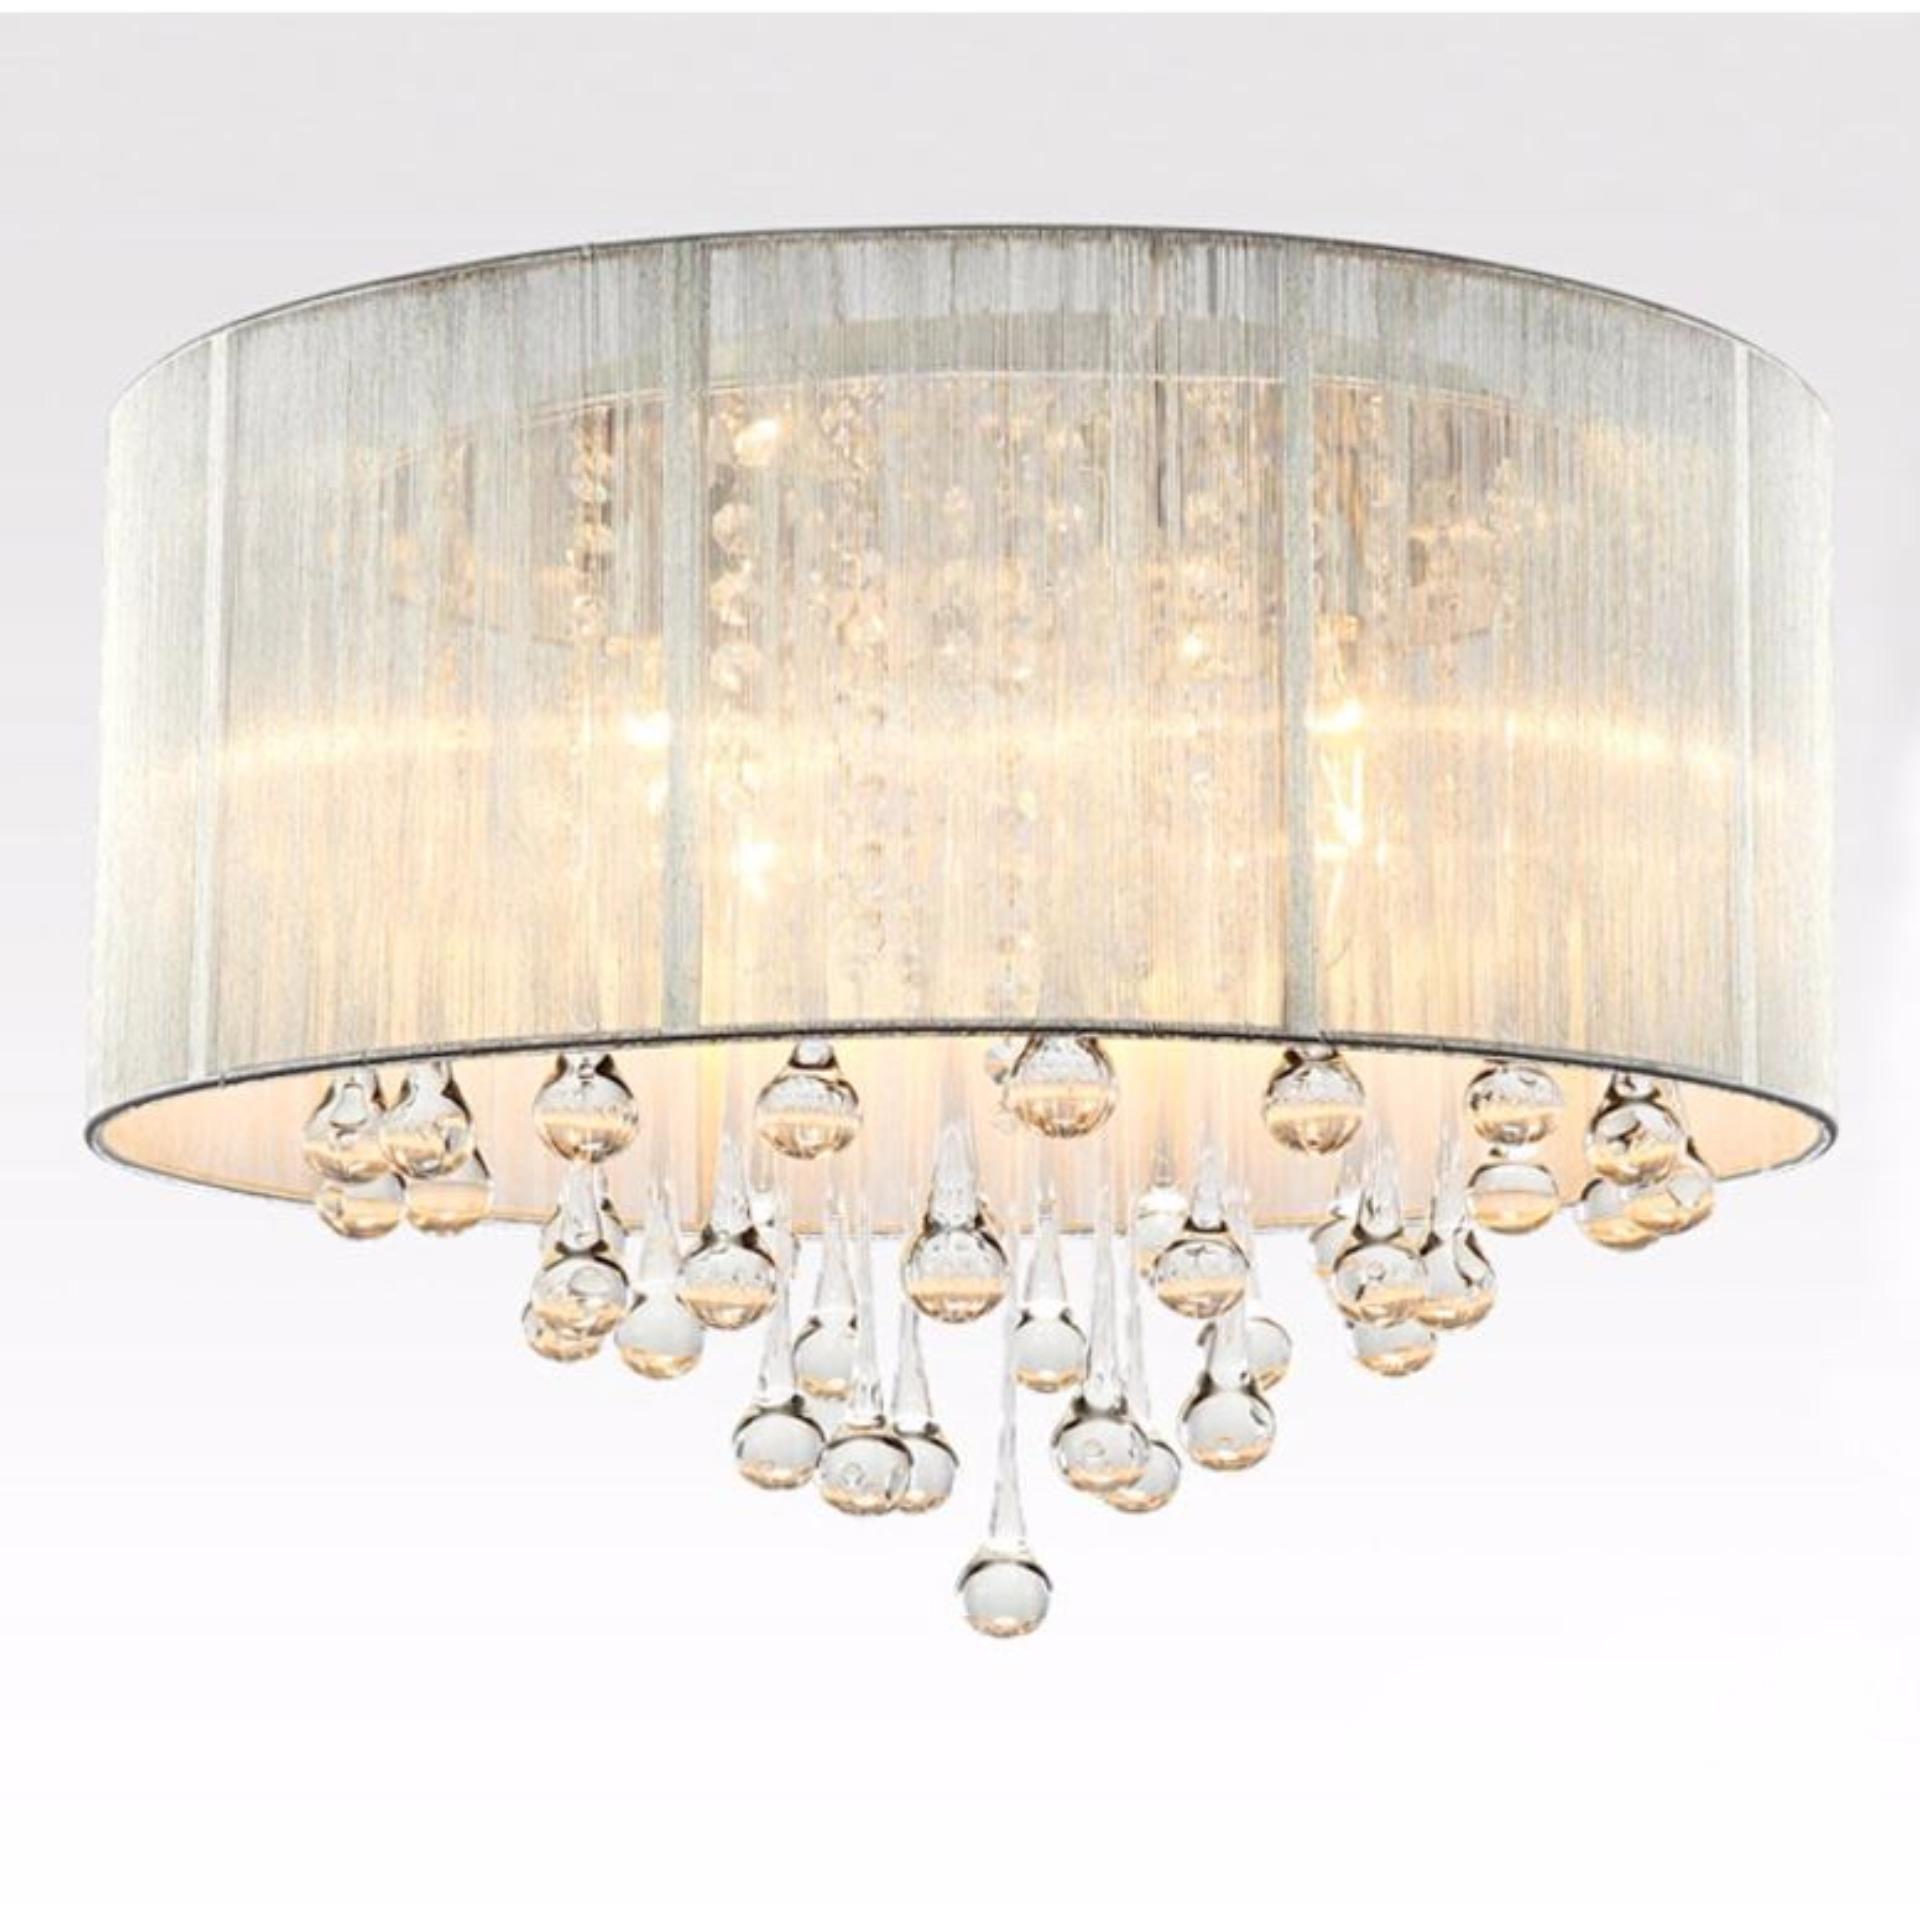 Crystal Modern Rain Drop LED Ceiling Light For Living Room Bedroom Dining  Room Singapore